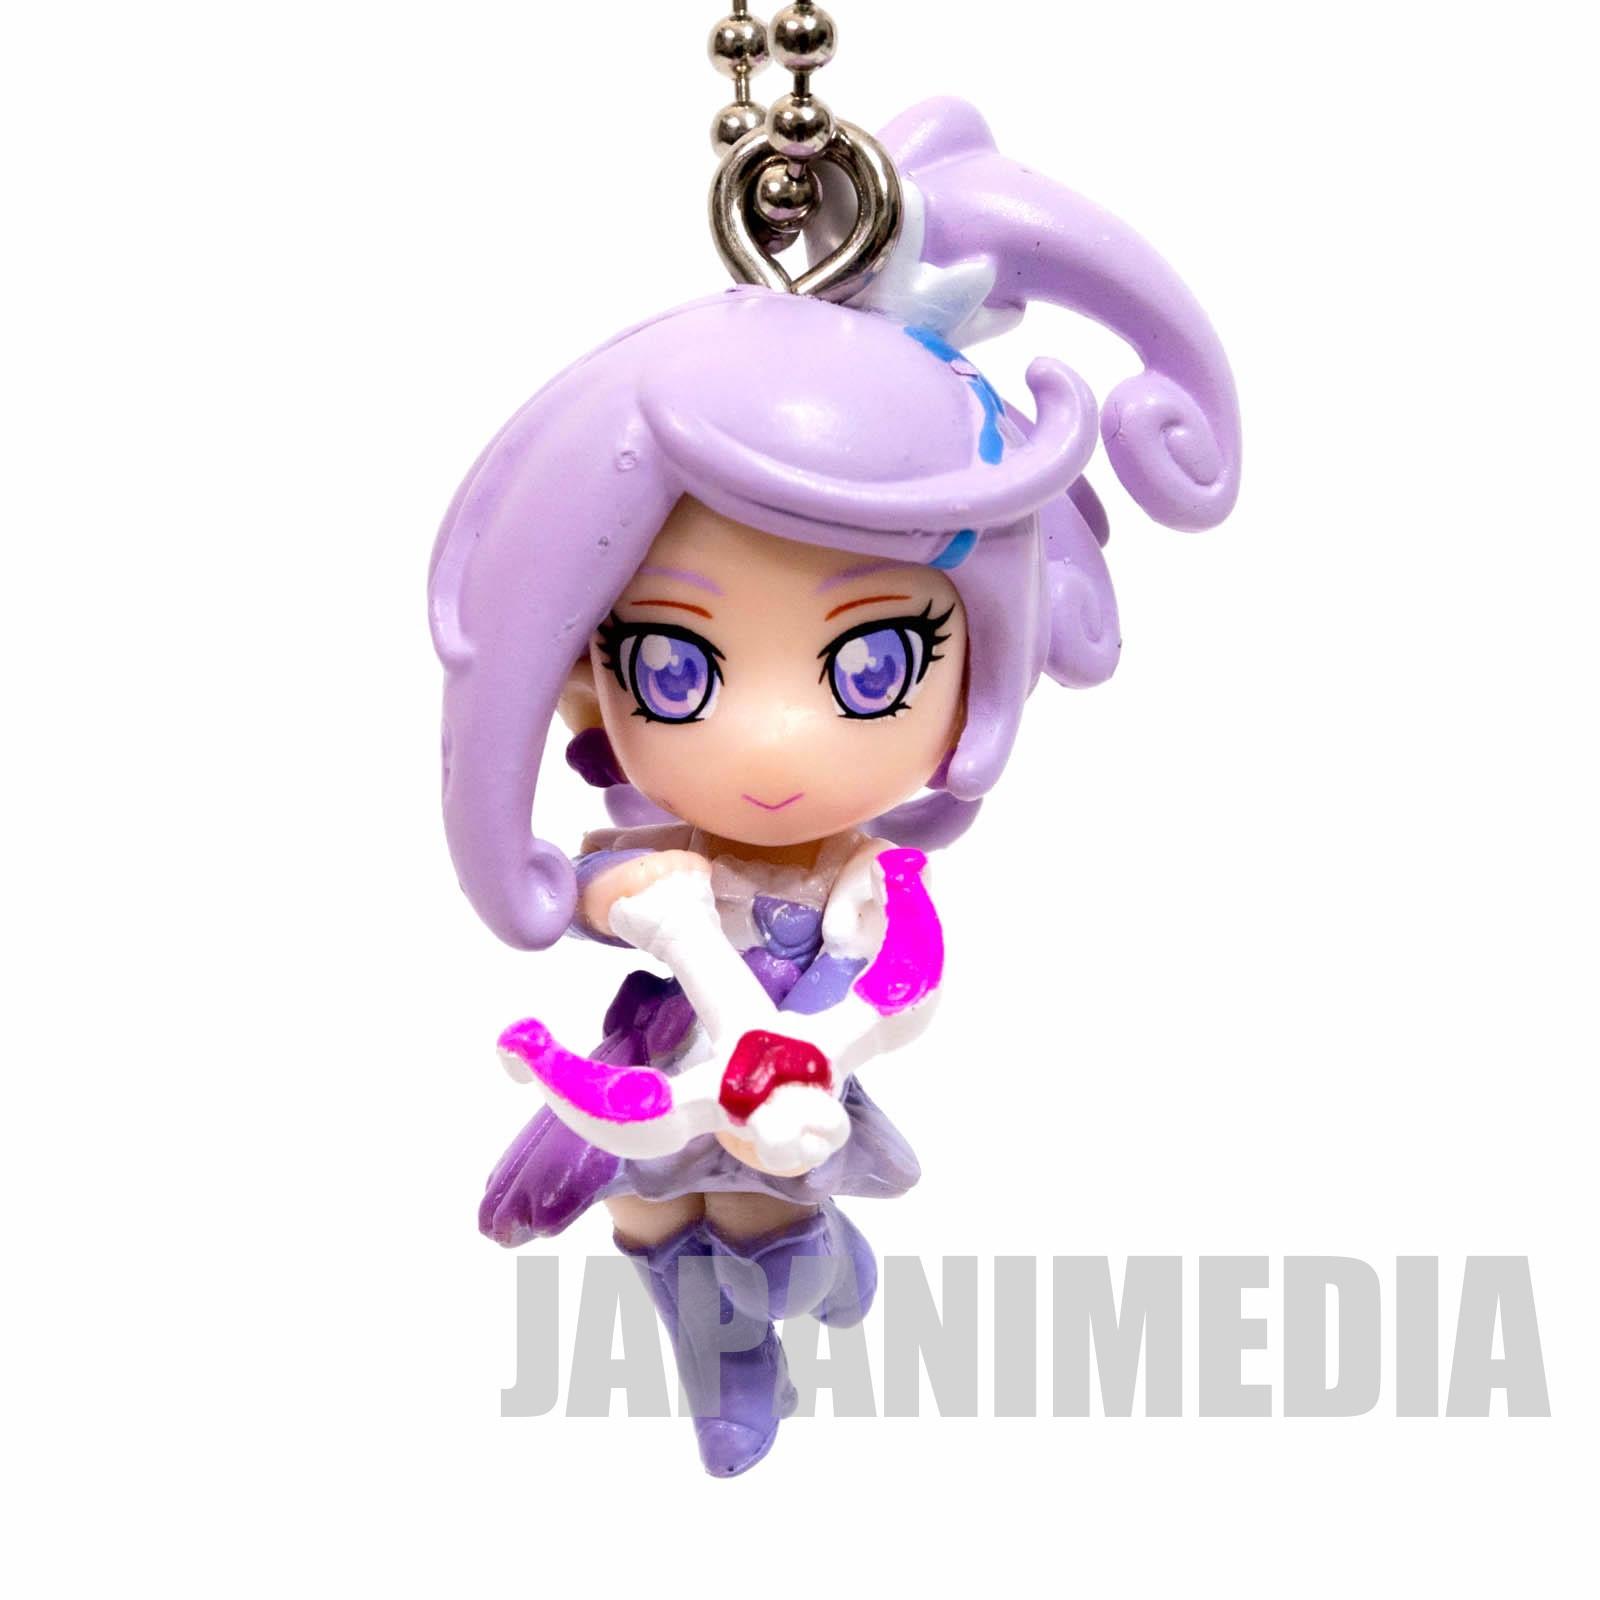 Doki Doki! PreCure Cure Sword Doki Doki Precure swing Mascot Figure Ball Keychain JAPAN ANIME